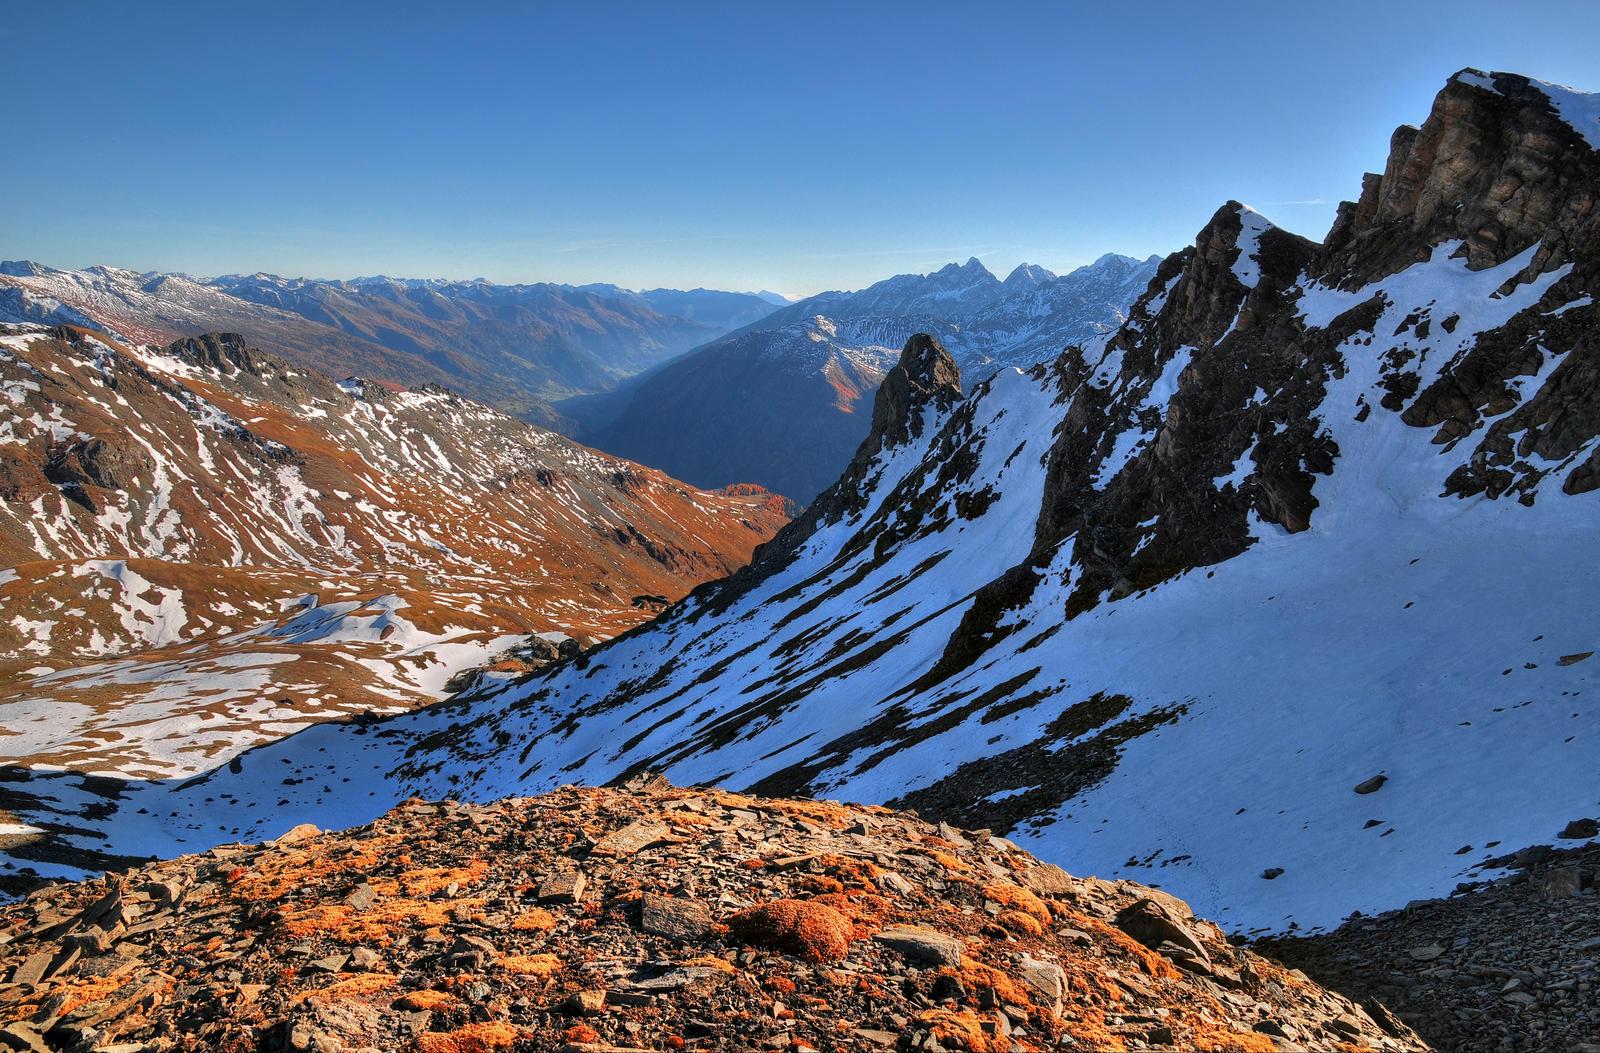 Valley View Background by Burtn